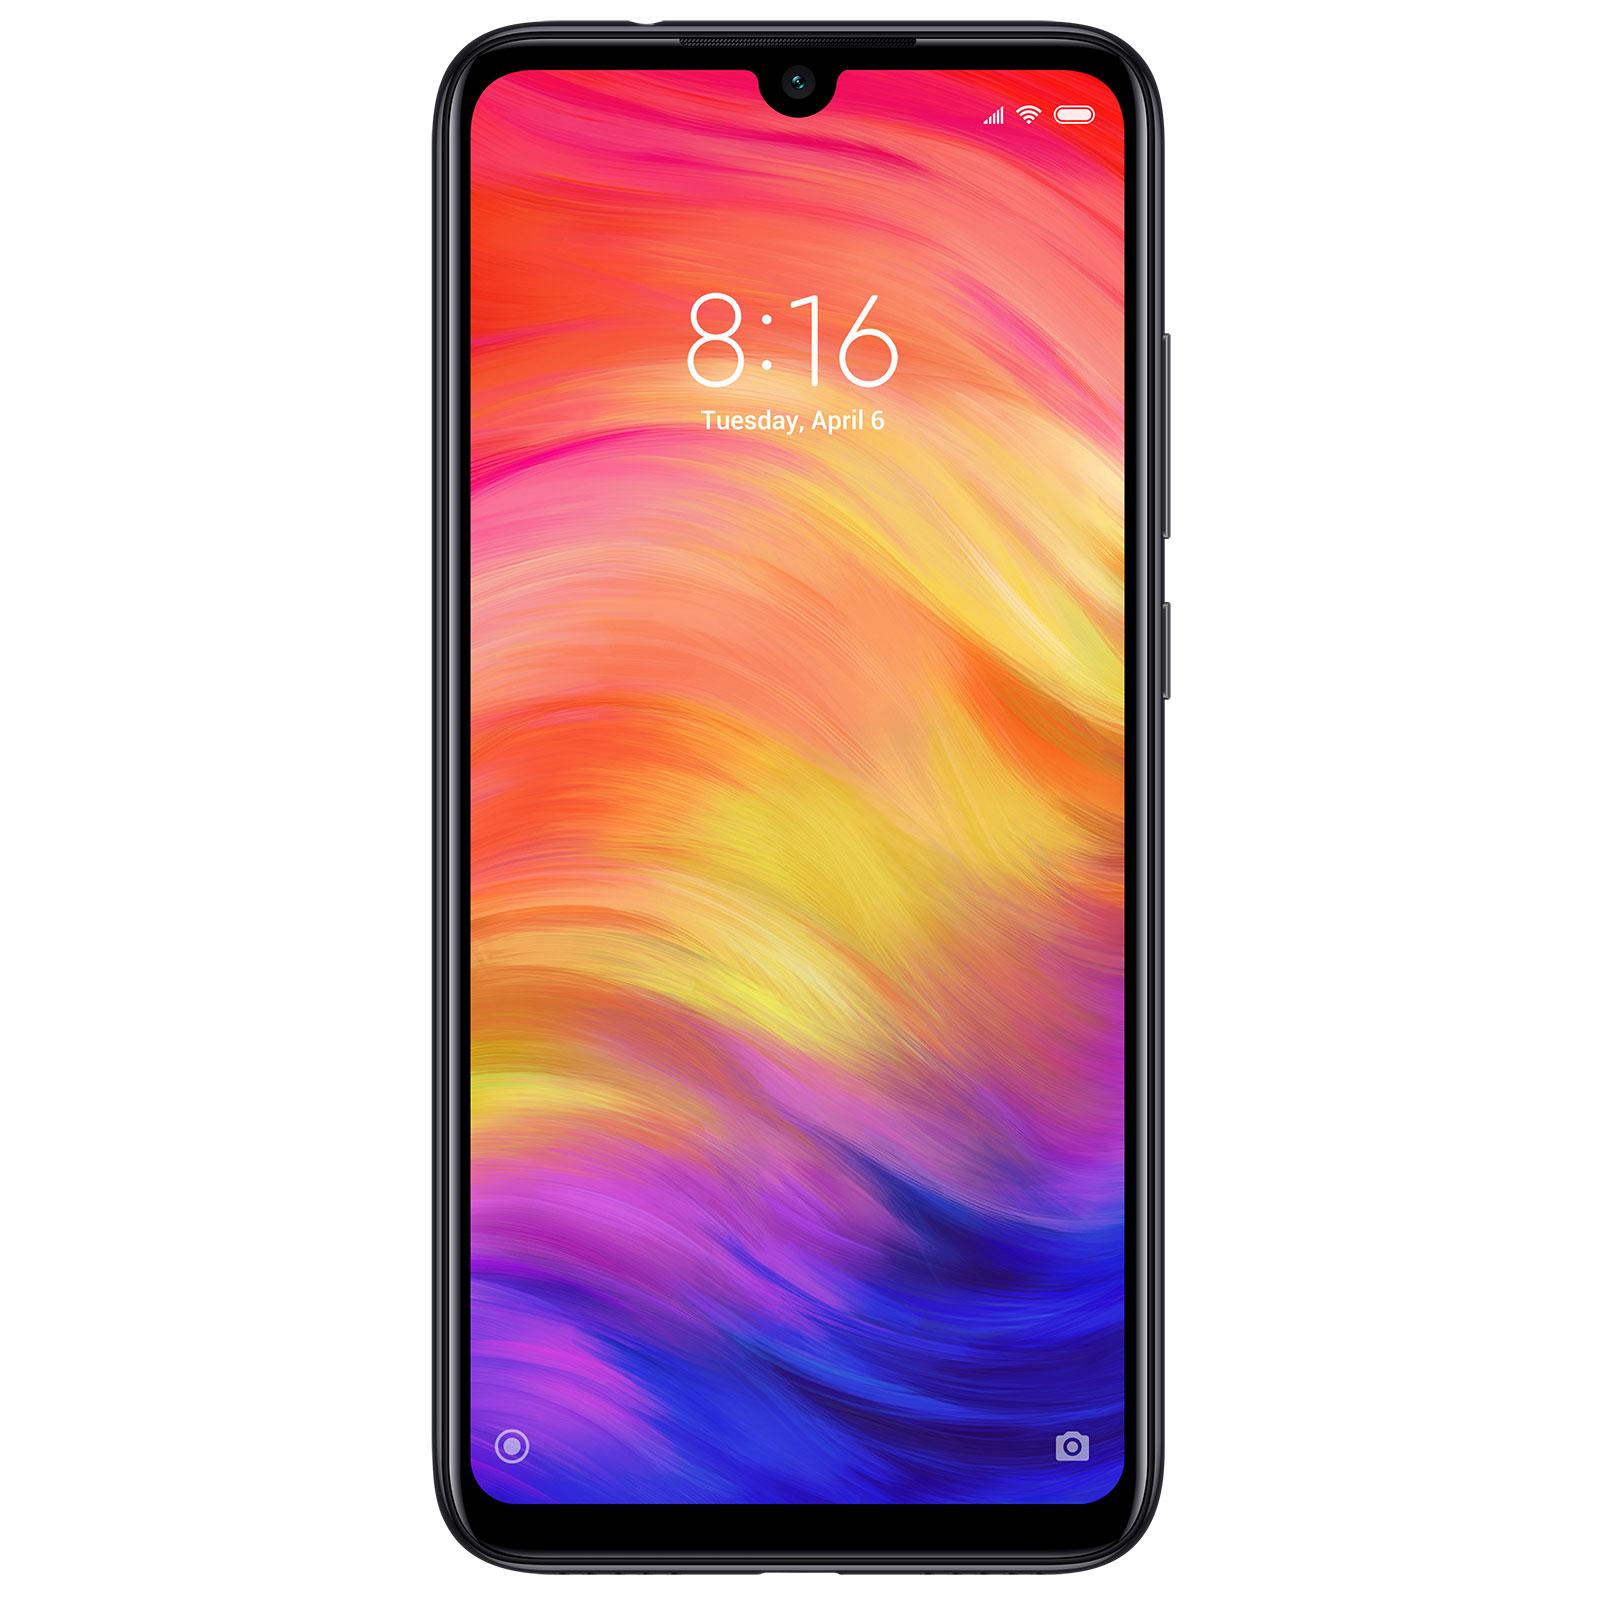 "Mobile & smartphone Xiaomi Redmi Note 7 Noir (3 Go / 32 Go) Smartphone 4G-LTE Dual SIM - Snapdragon 660 Octo-Core 2.2 GHz - RAM 3 Go - Ecran tactile 6.3"" 1080 x 2340 - 32 Go - Bluetooth 5.0 - 4000 mAh - Android 9.0"